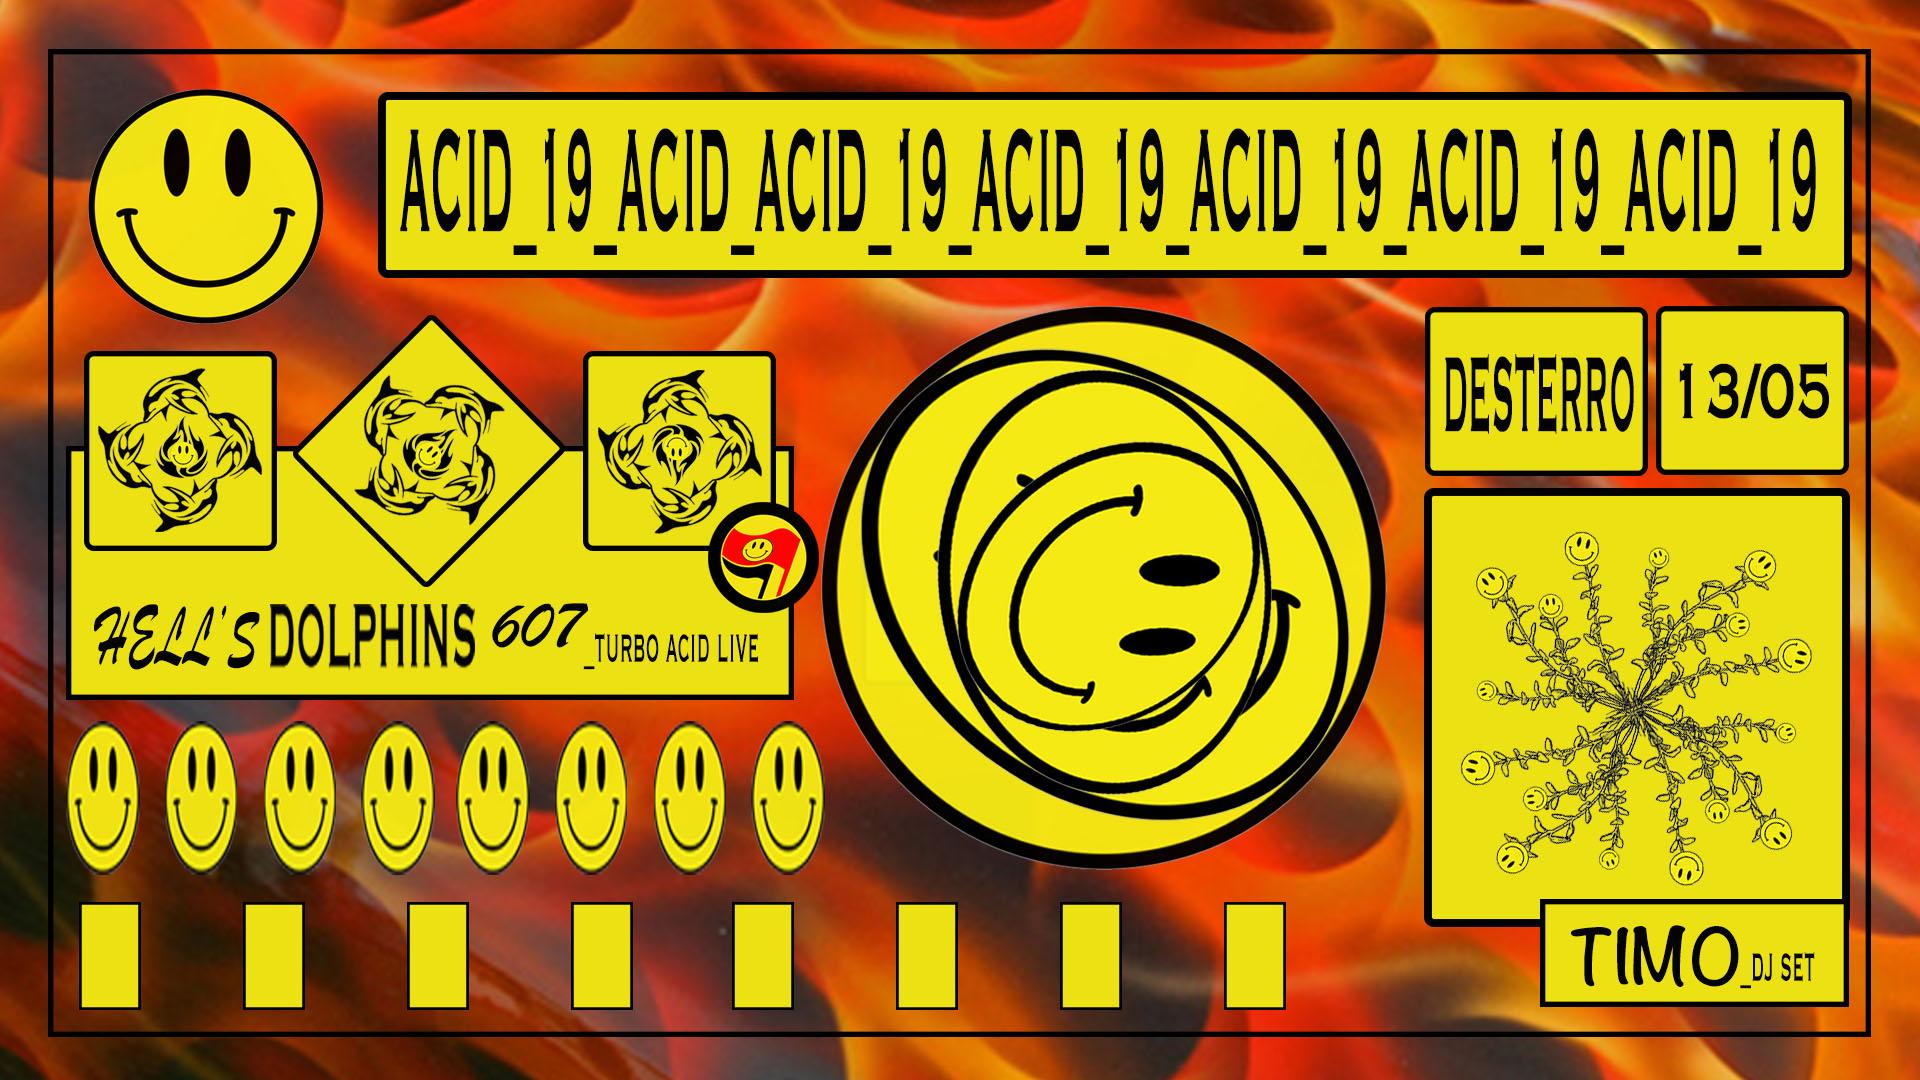 ACID_19 Hell'sDolphins607 DjTimo